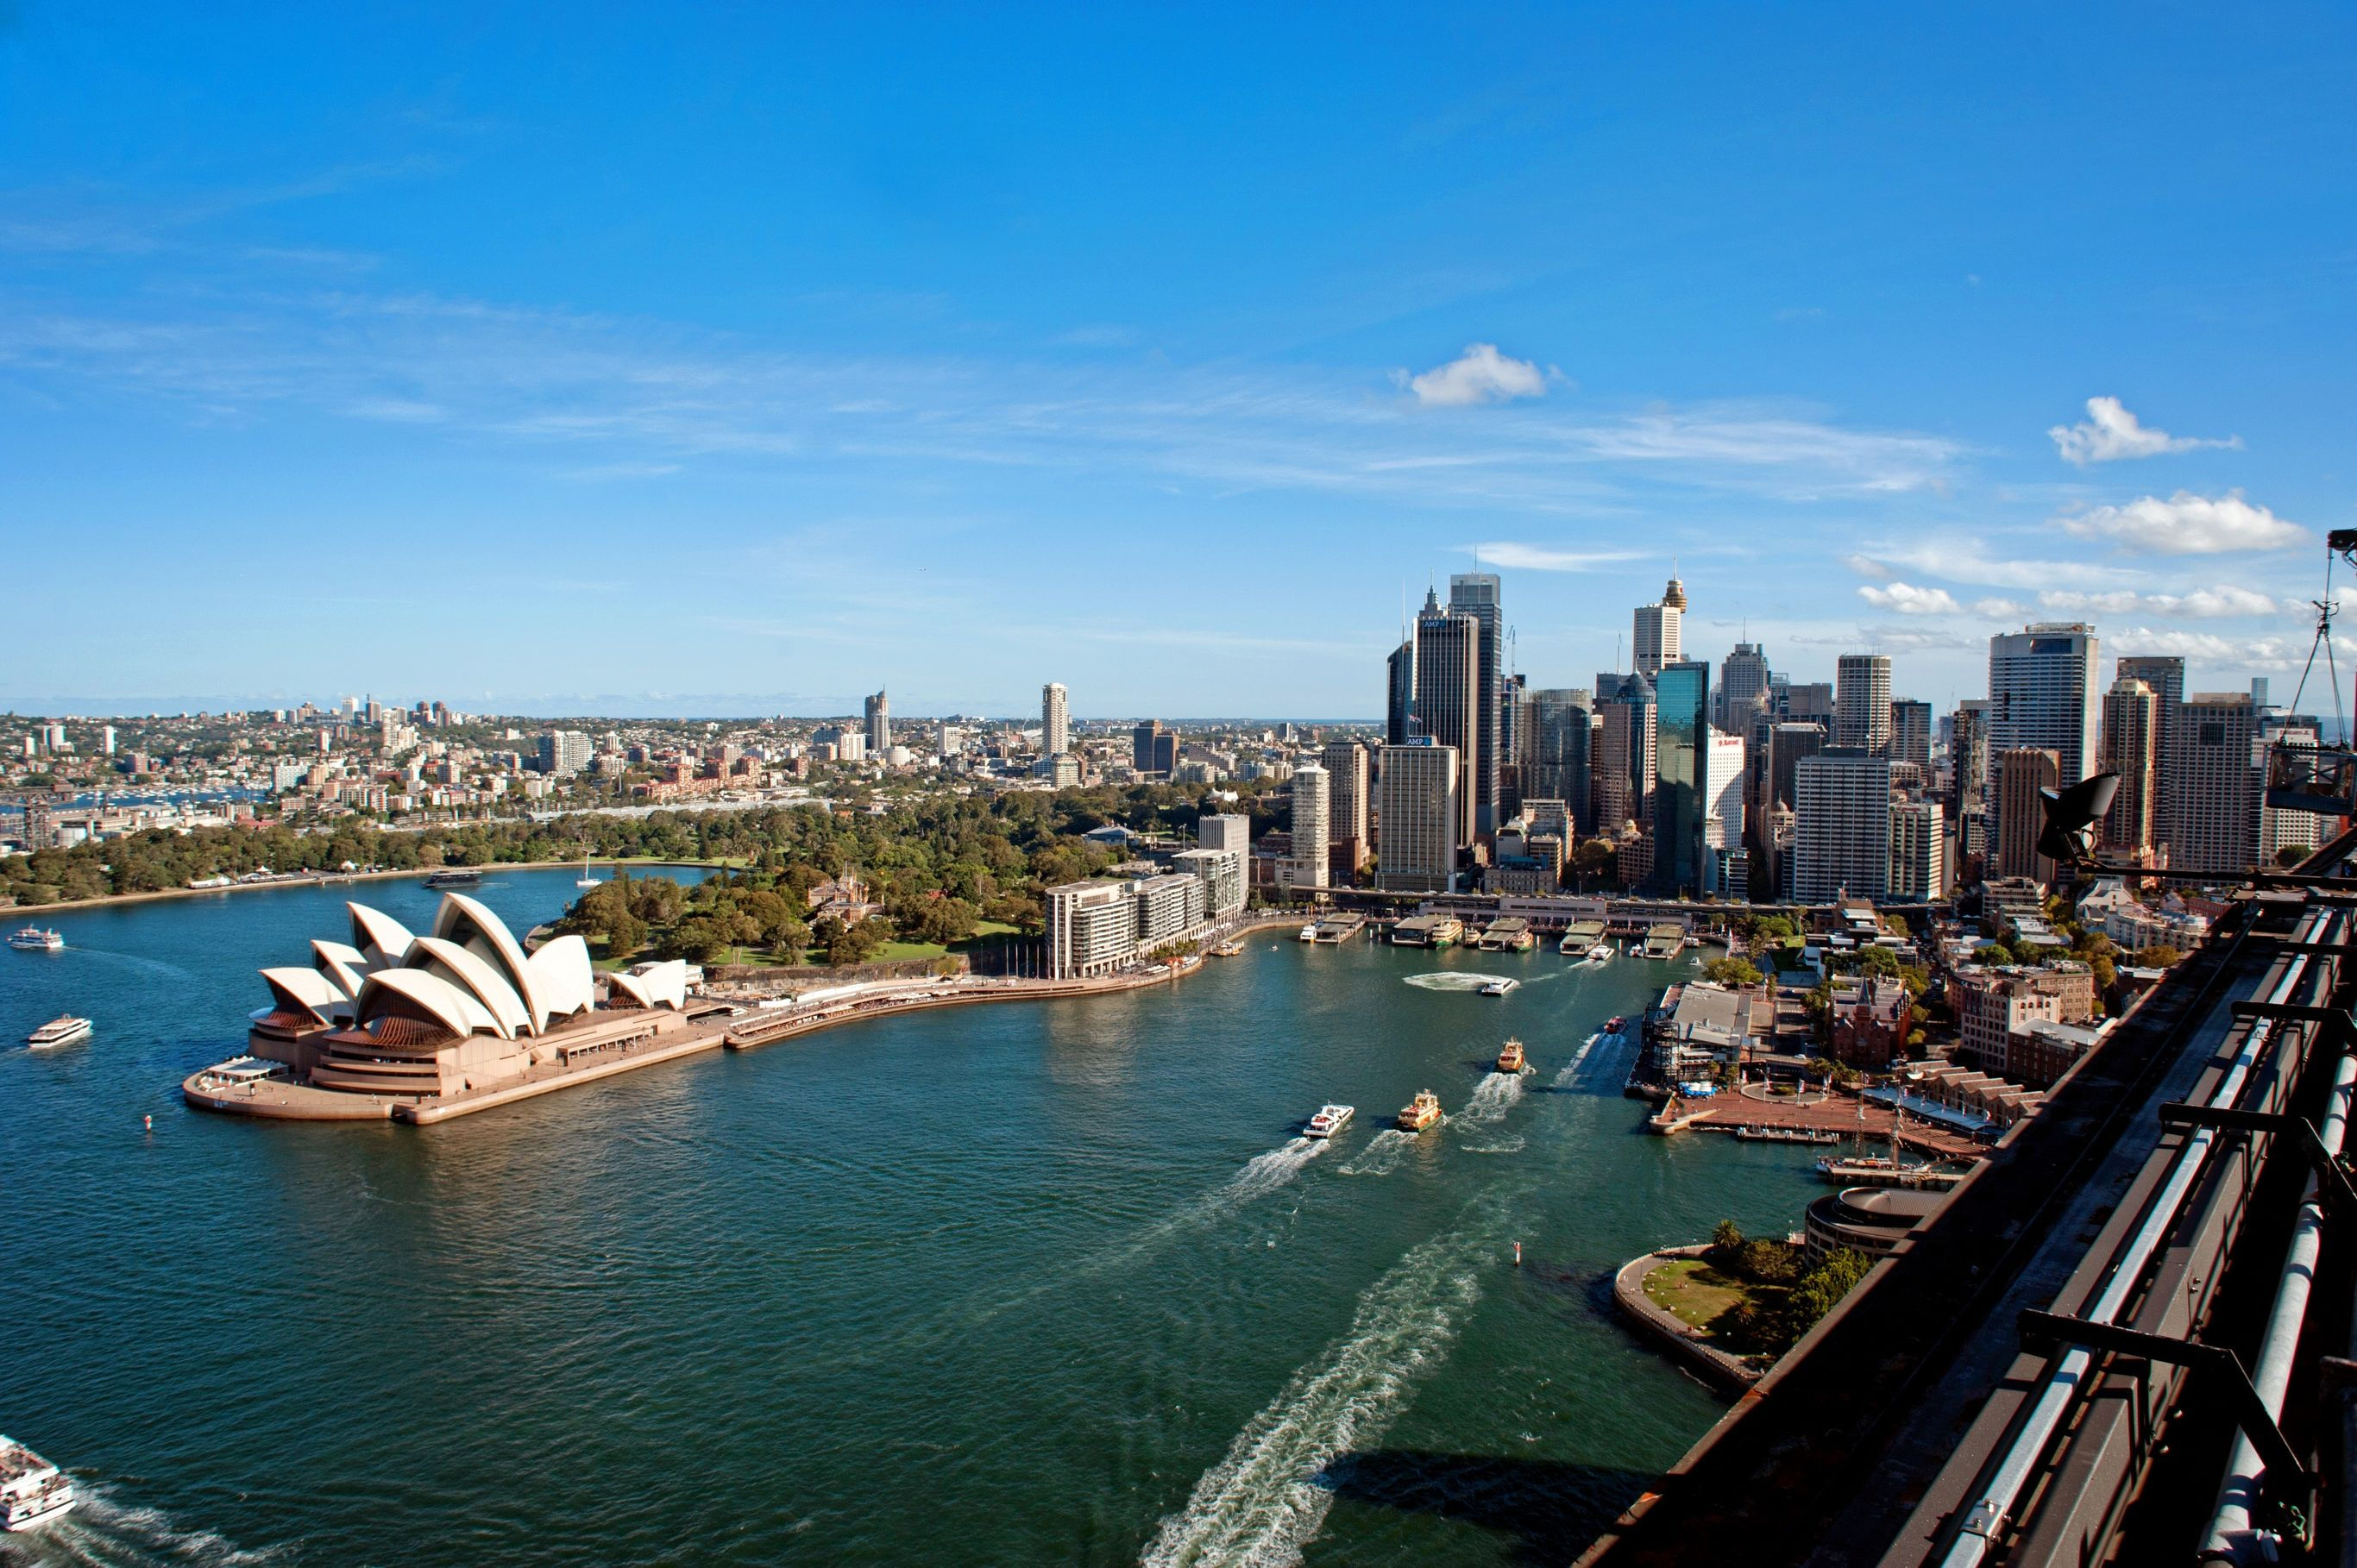 Australie-Sydney-haven-opera-house_2_559808 Australië